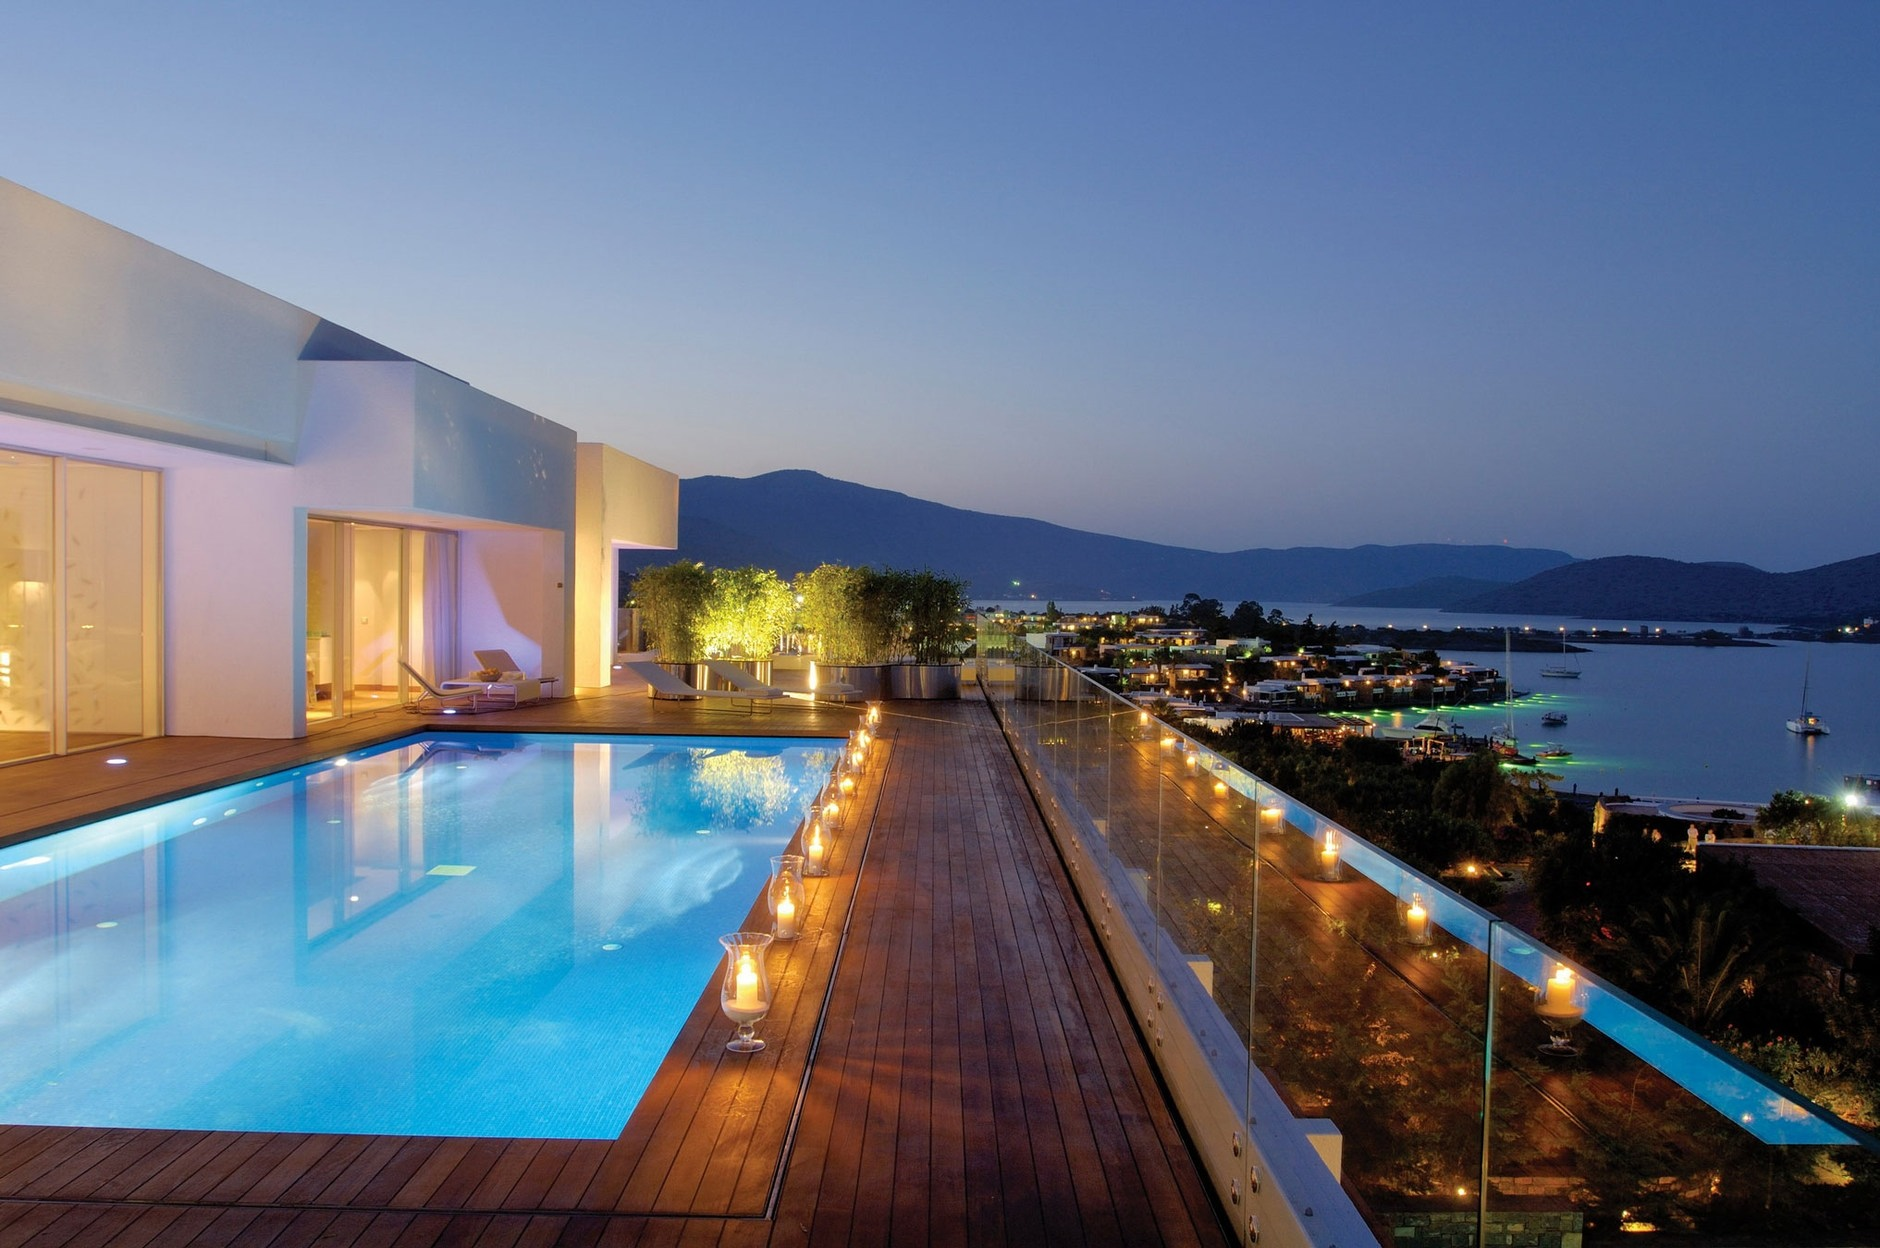 Yachting club villas at elounda beach by davide macullo for Design hotel kreta